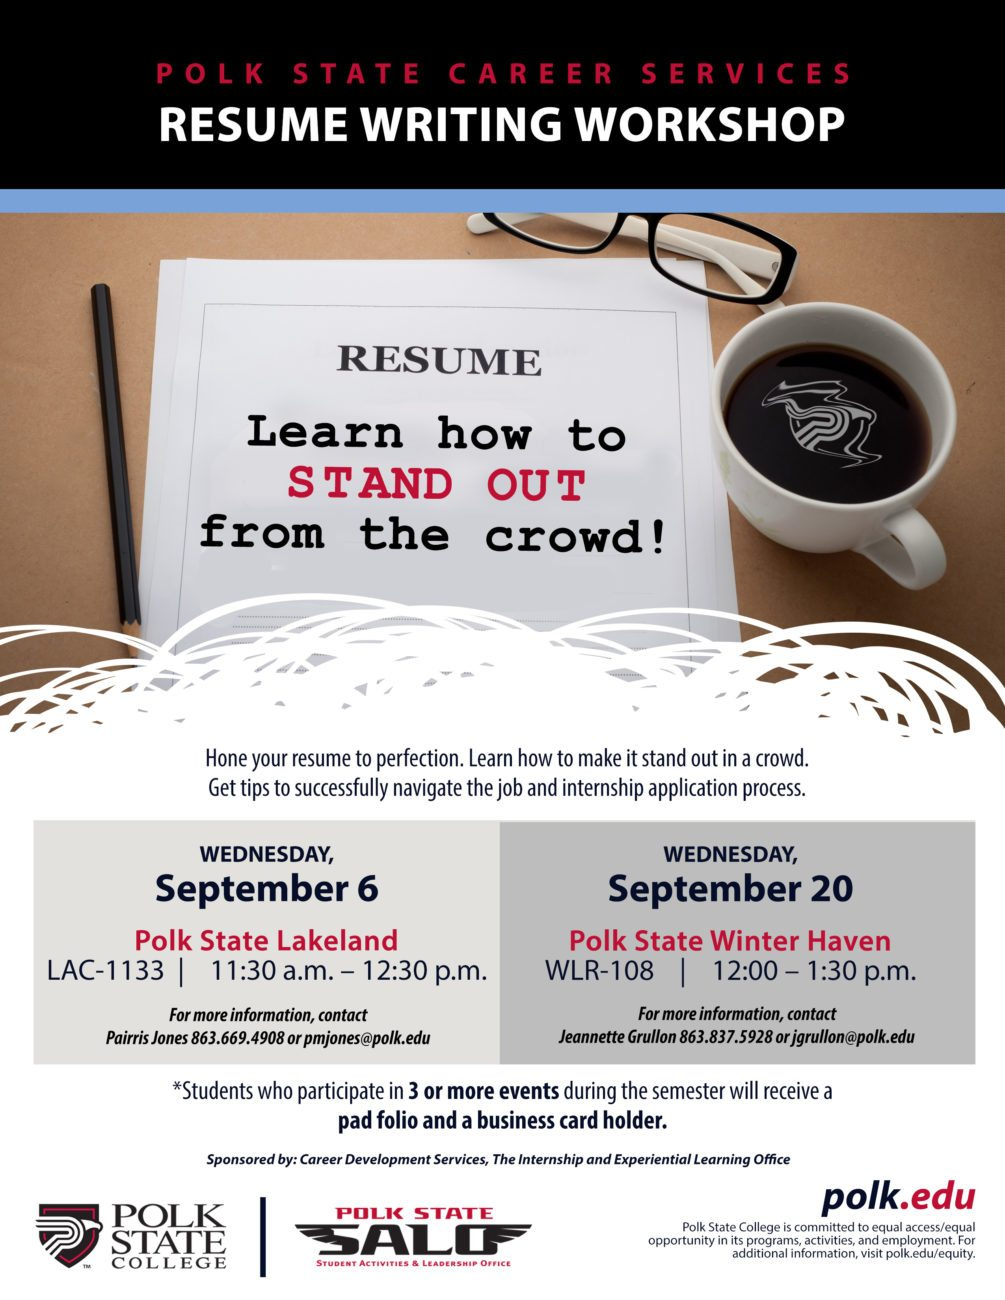 Resume Workshop Extraordinary Polk State Career Development Services Resume Writing Workshop